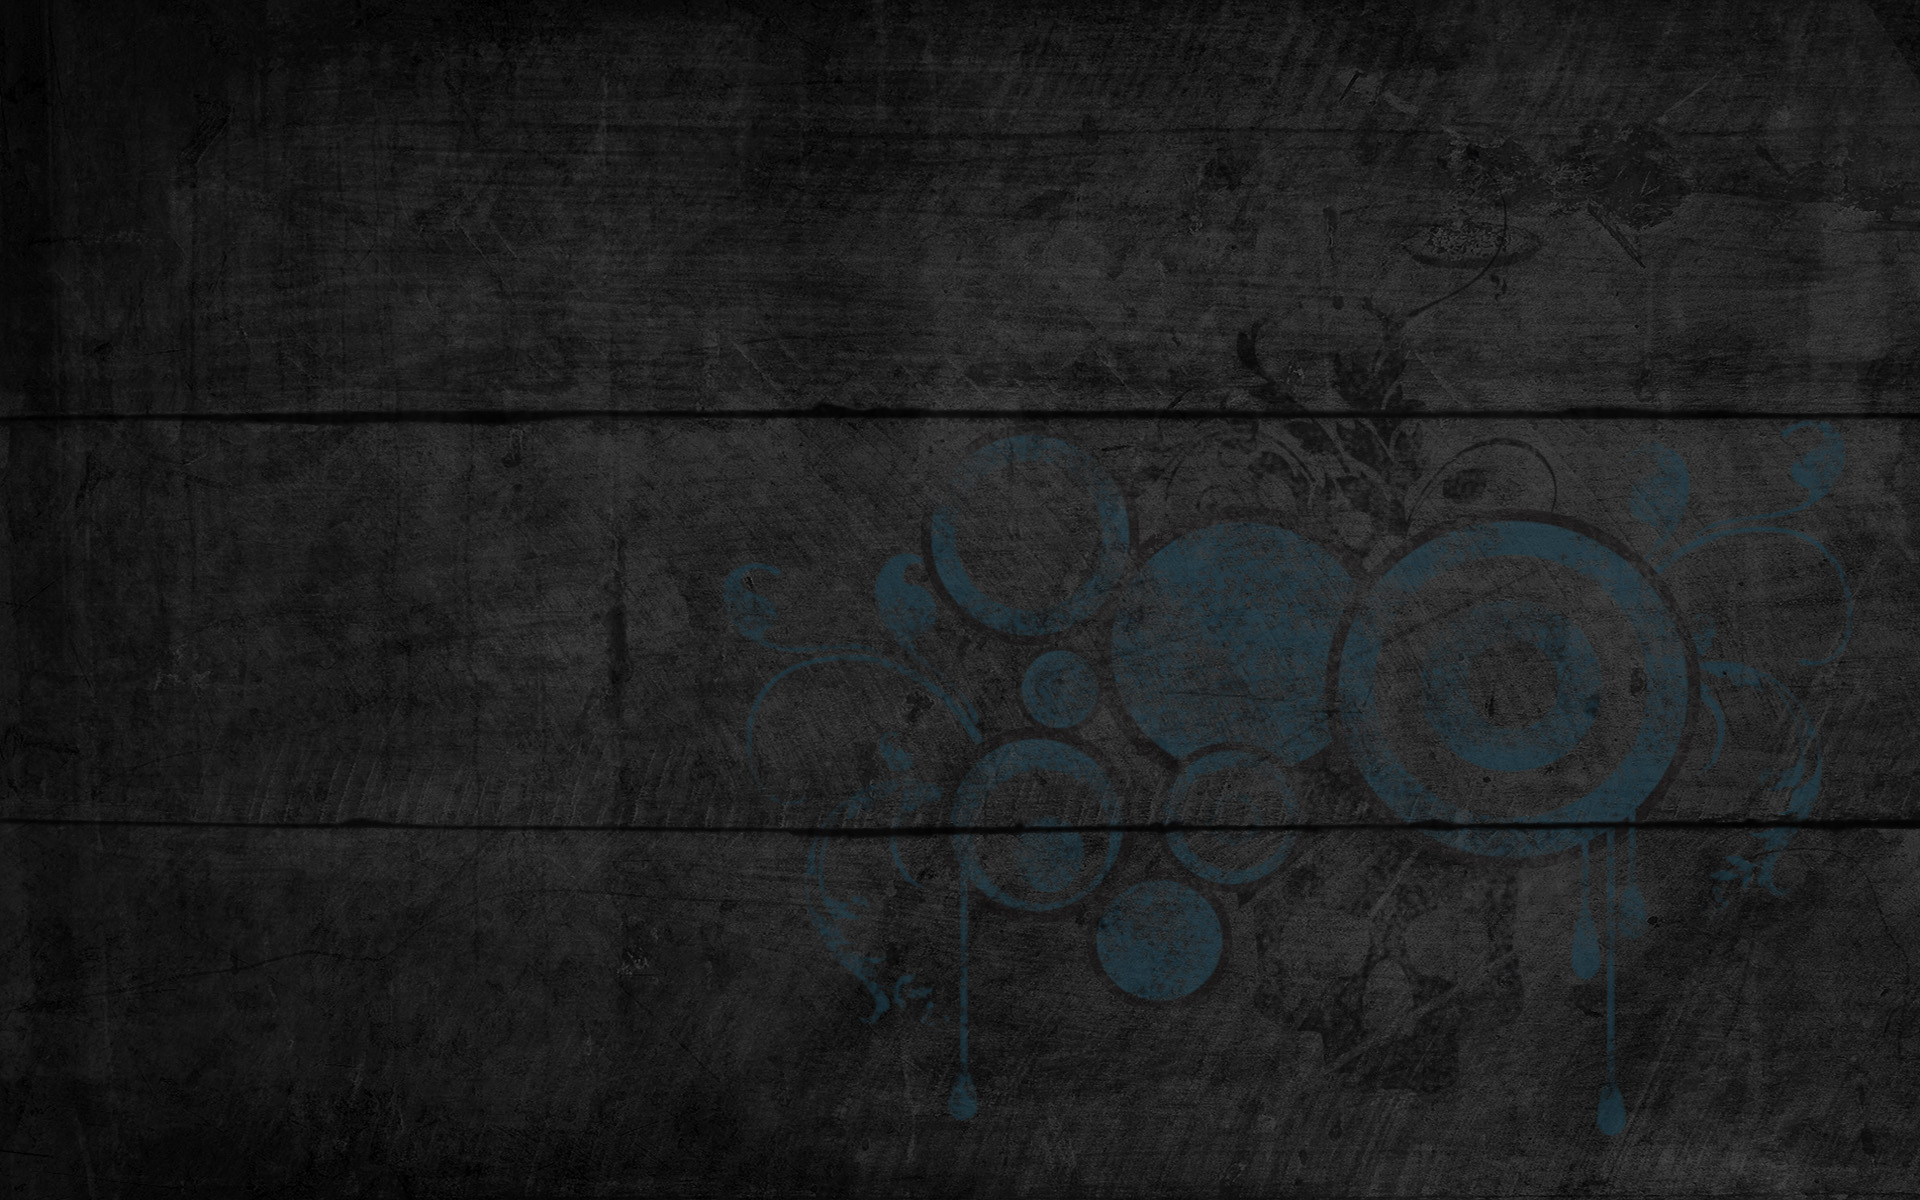 wallpaper distressed by j sheldon on deviantart